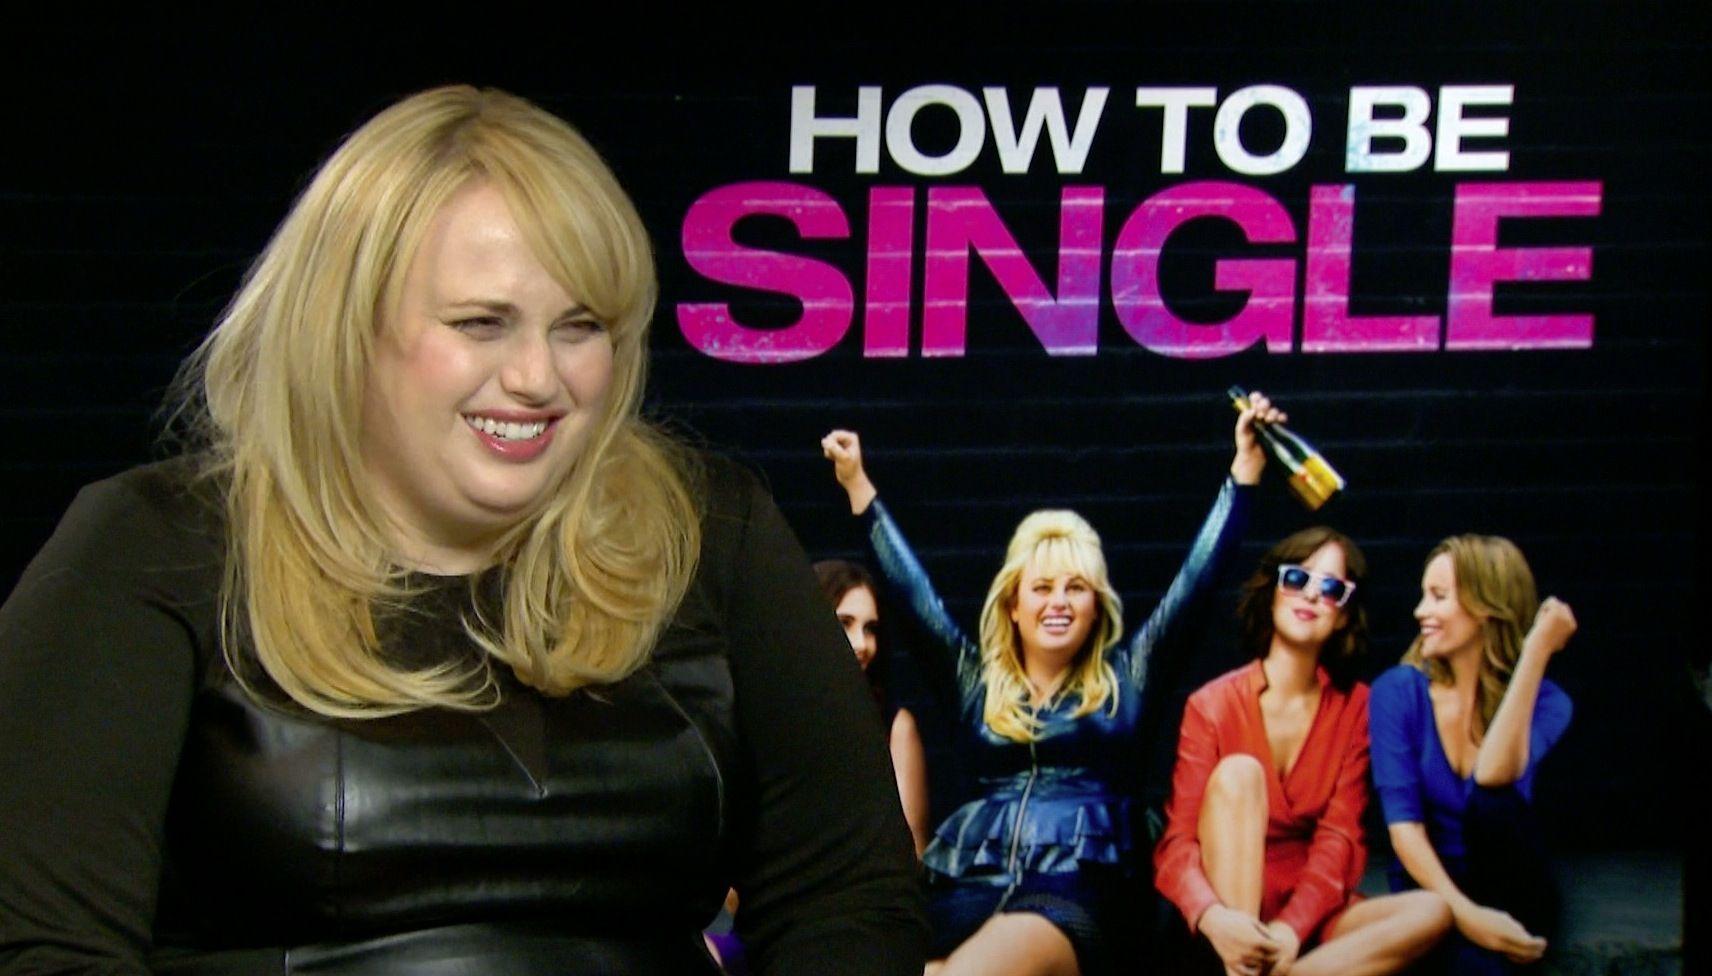 Rebel Wilson Being Interviewed By Random Tinder Men Is Lol How To Be Single  Movie Poster